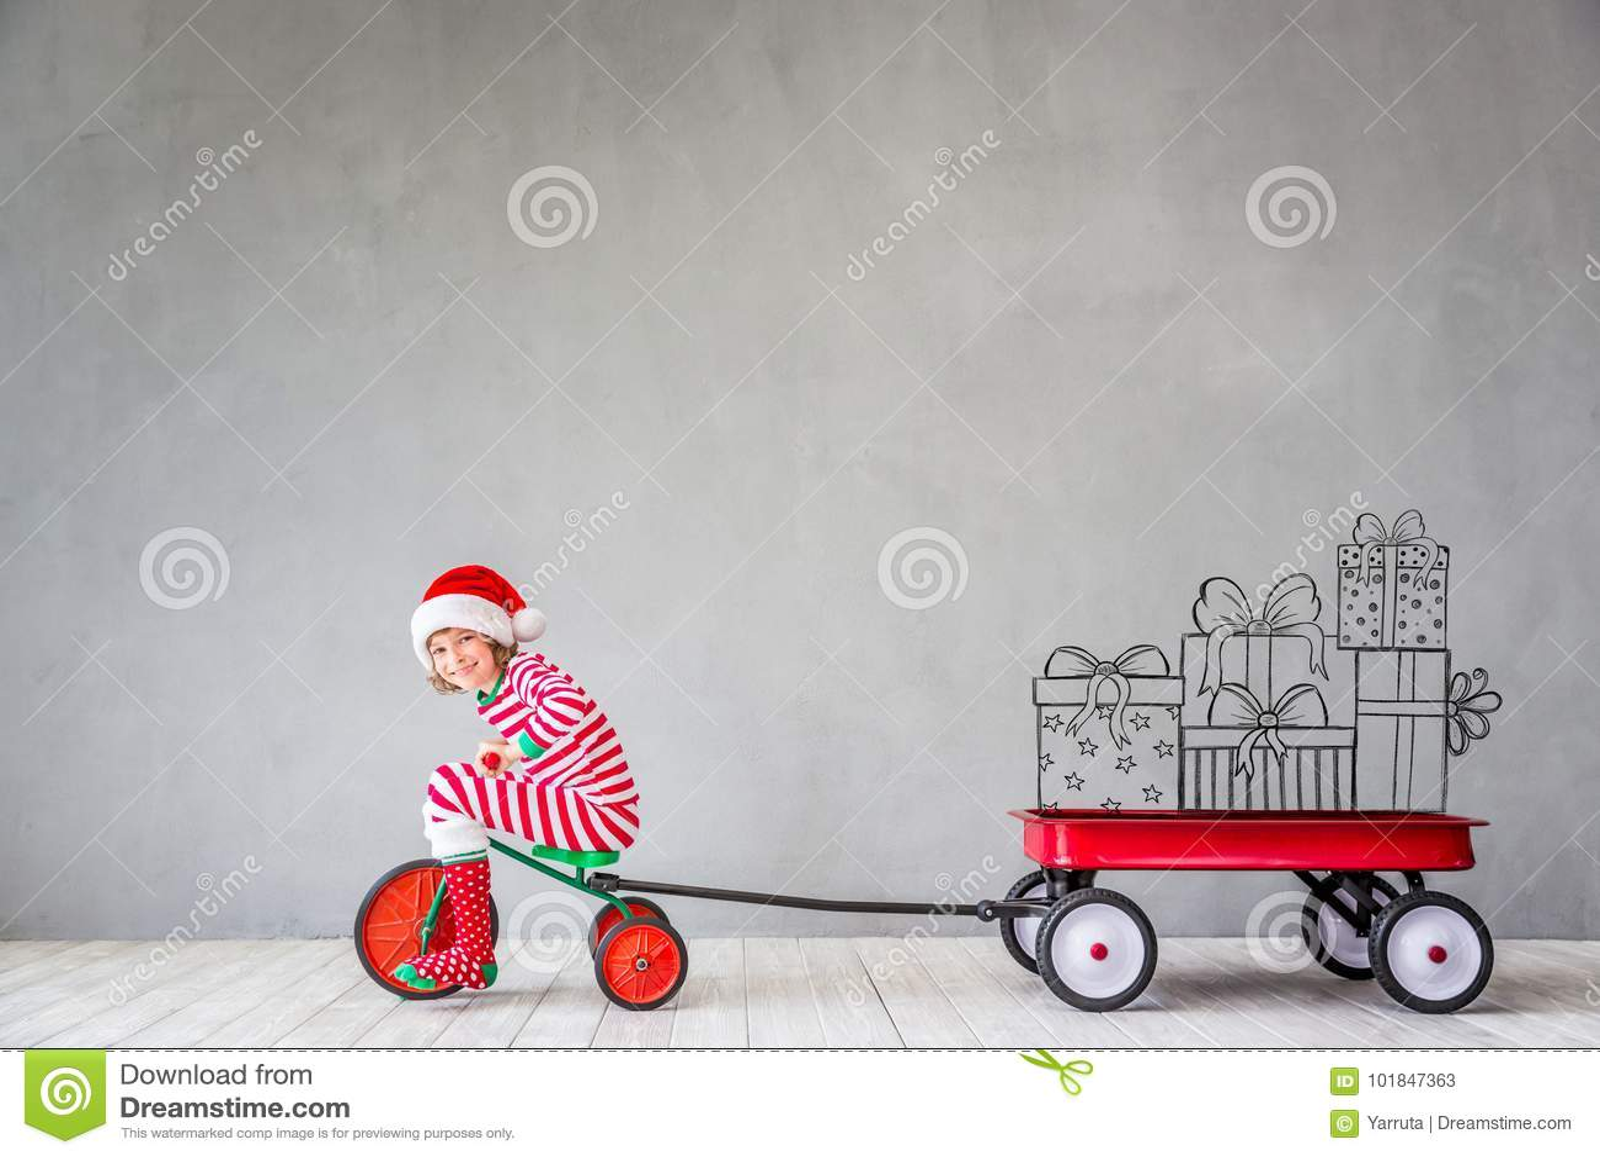 Christmas Xmas Winter Holiday Concept